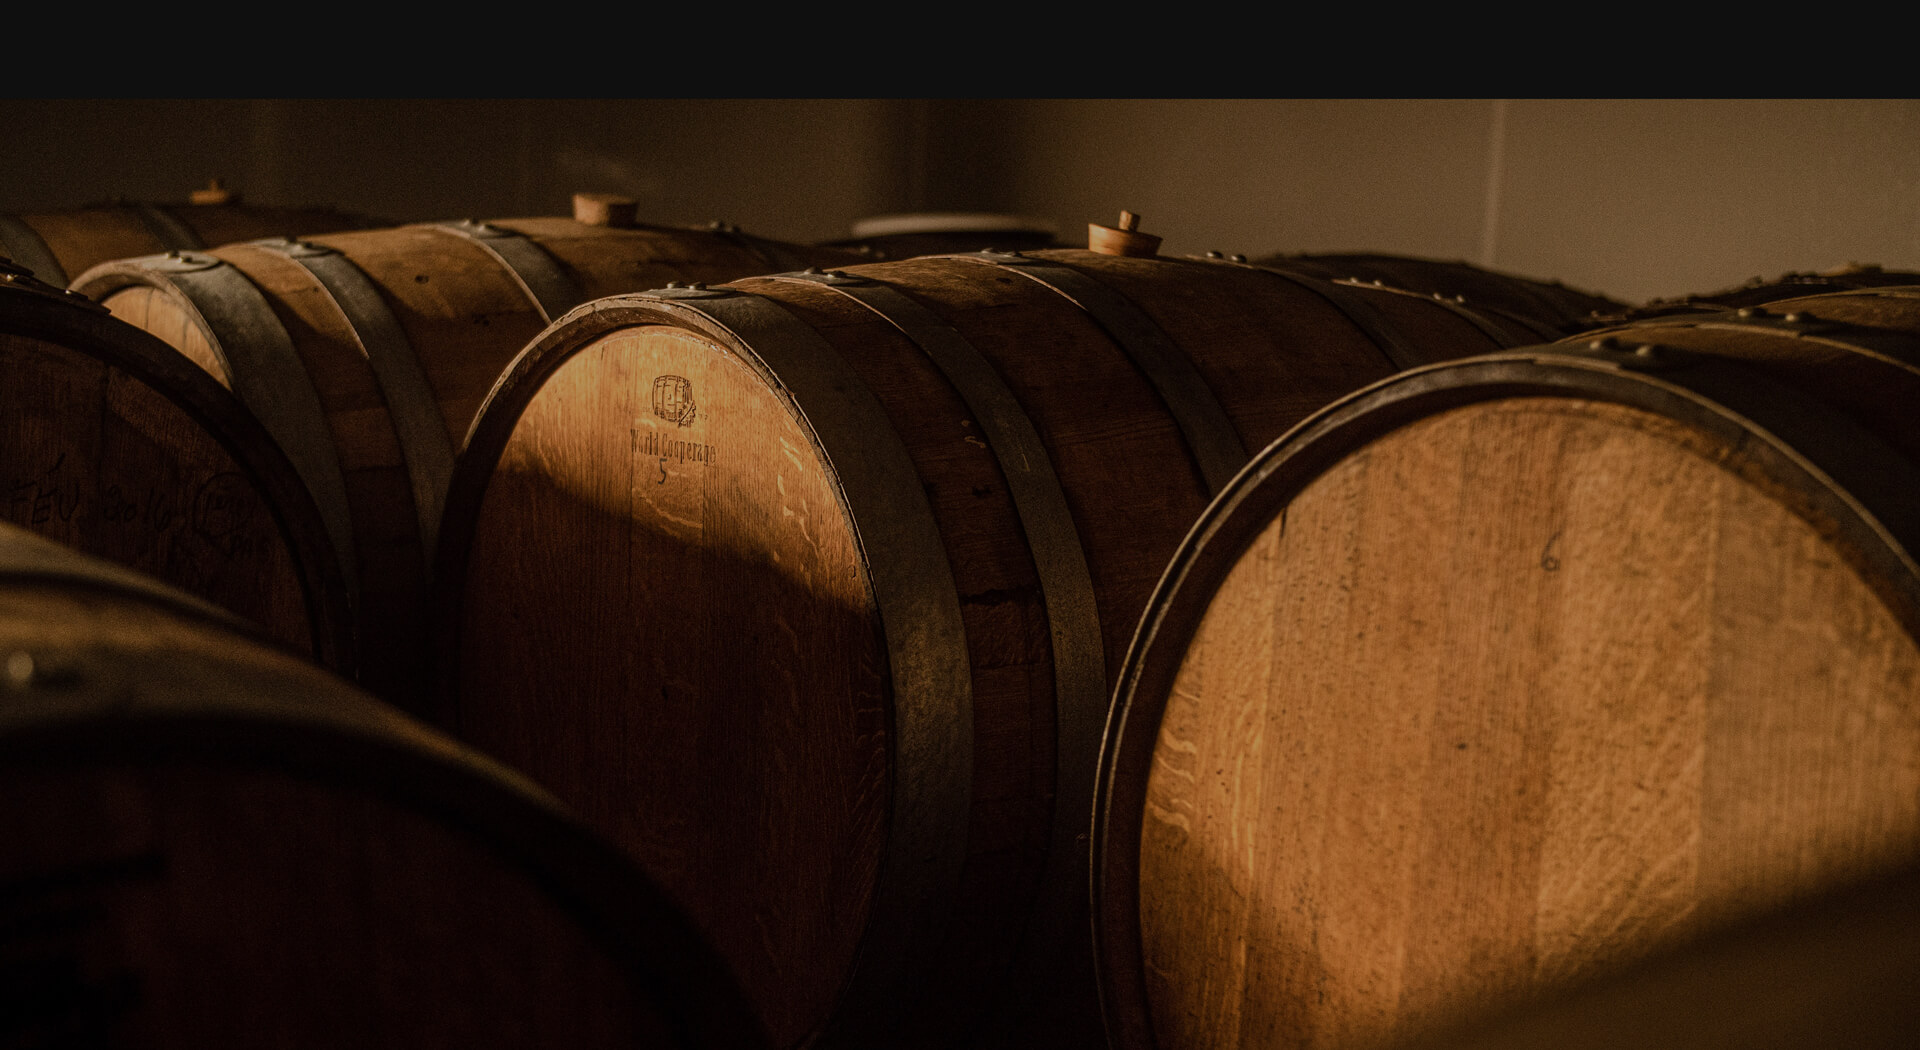 Bilboquet | Nos Bières